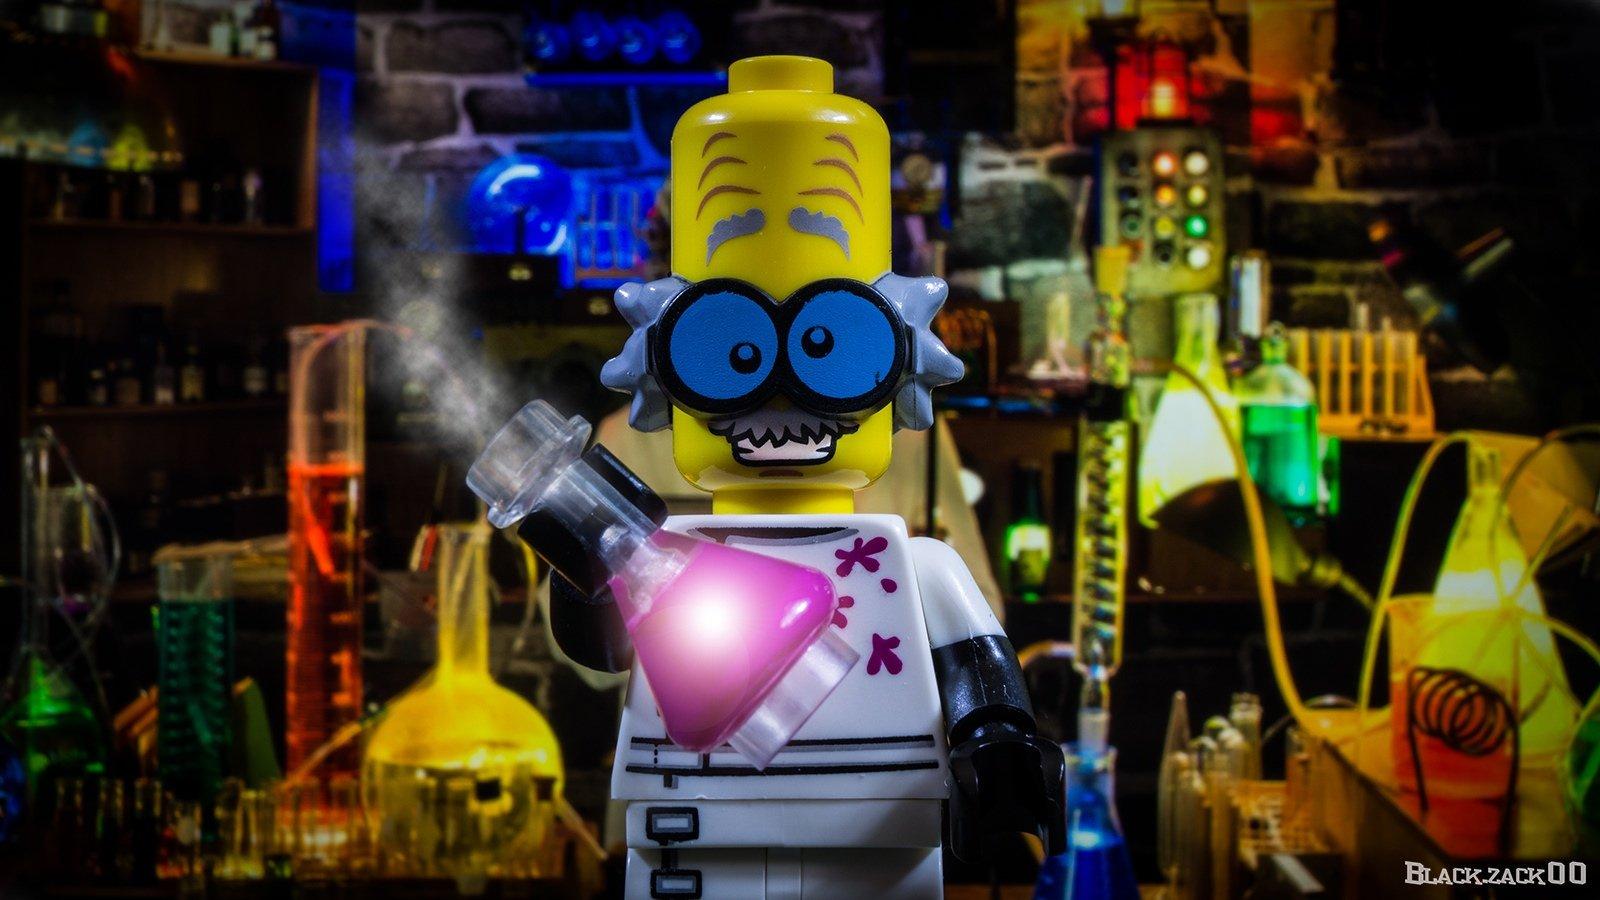 A LEGO scientist